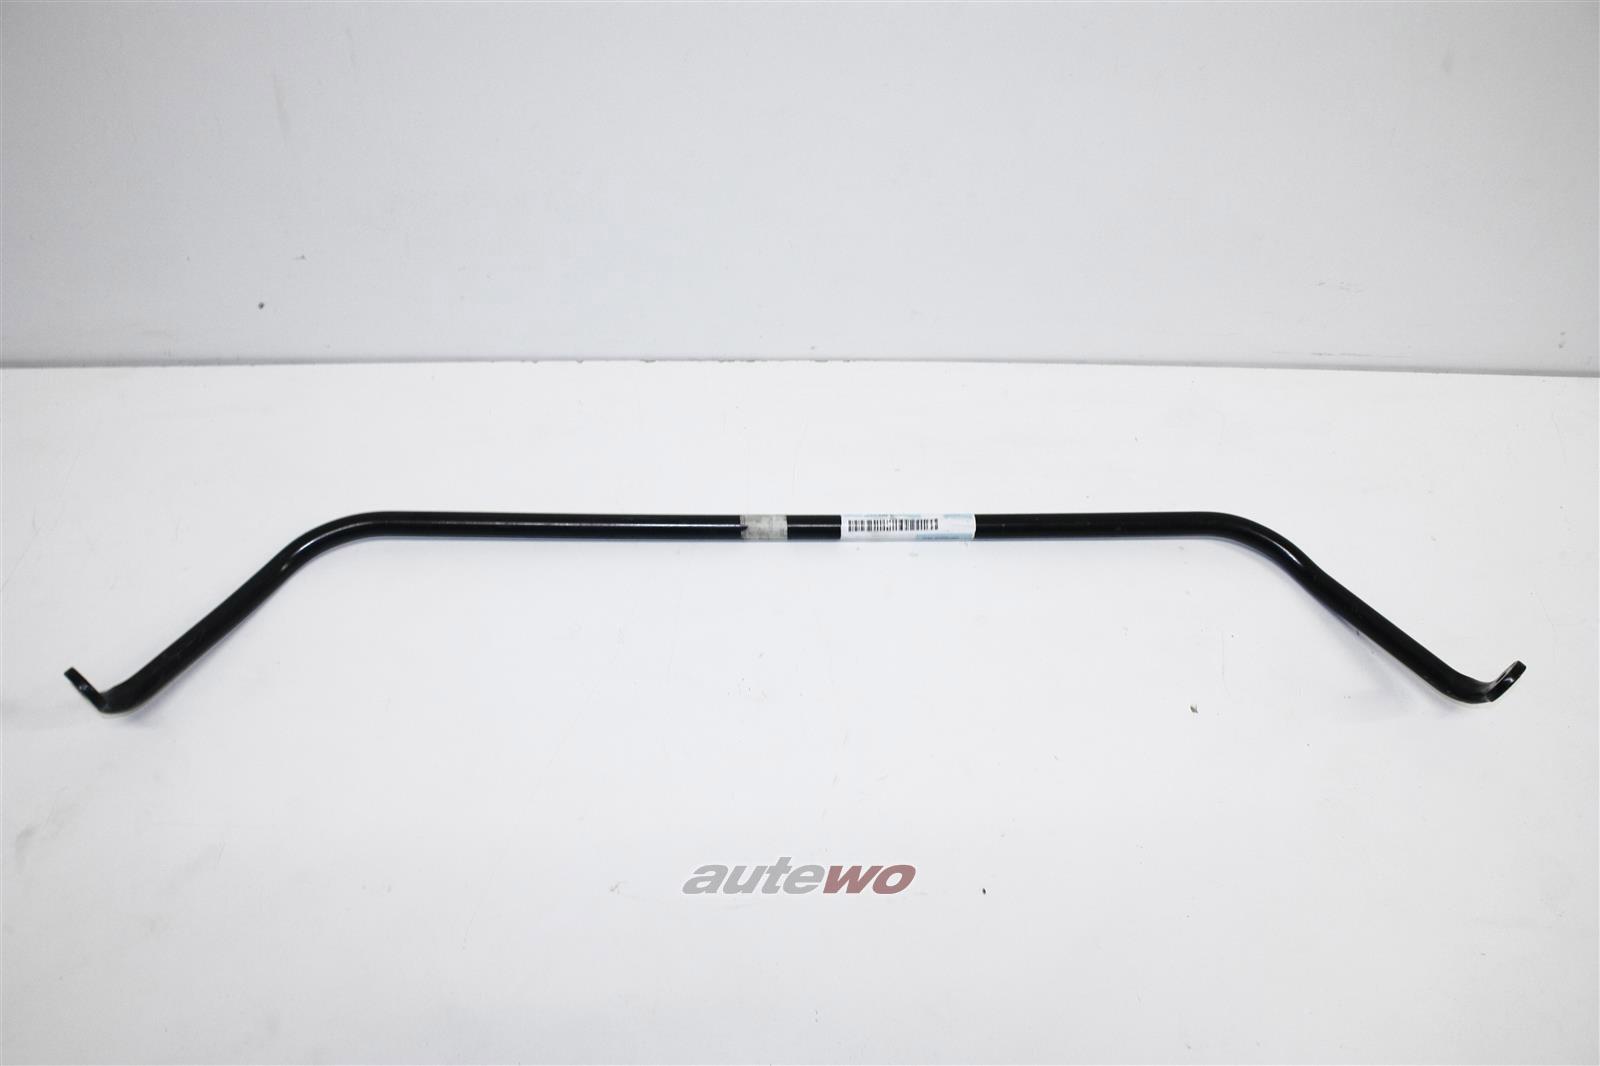 NEU! Audi Sportquattro Orig. Stabilisator Hinten 859511409A